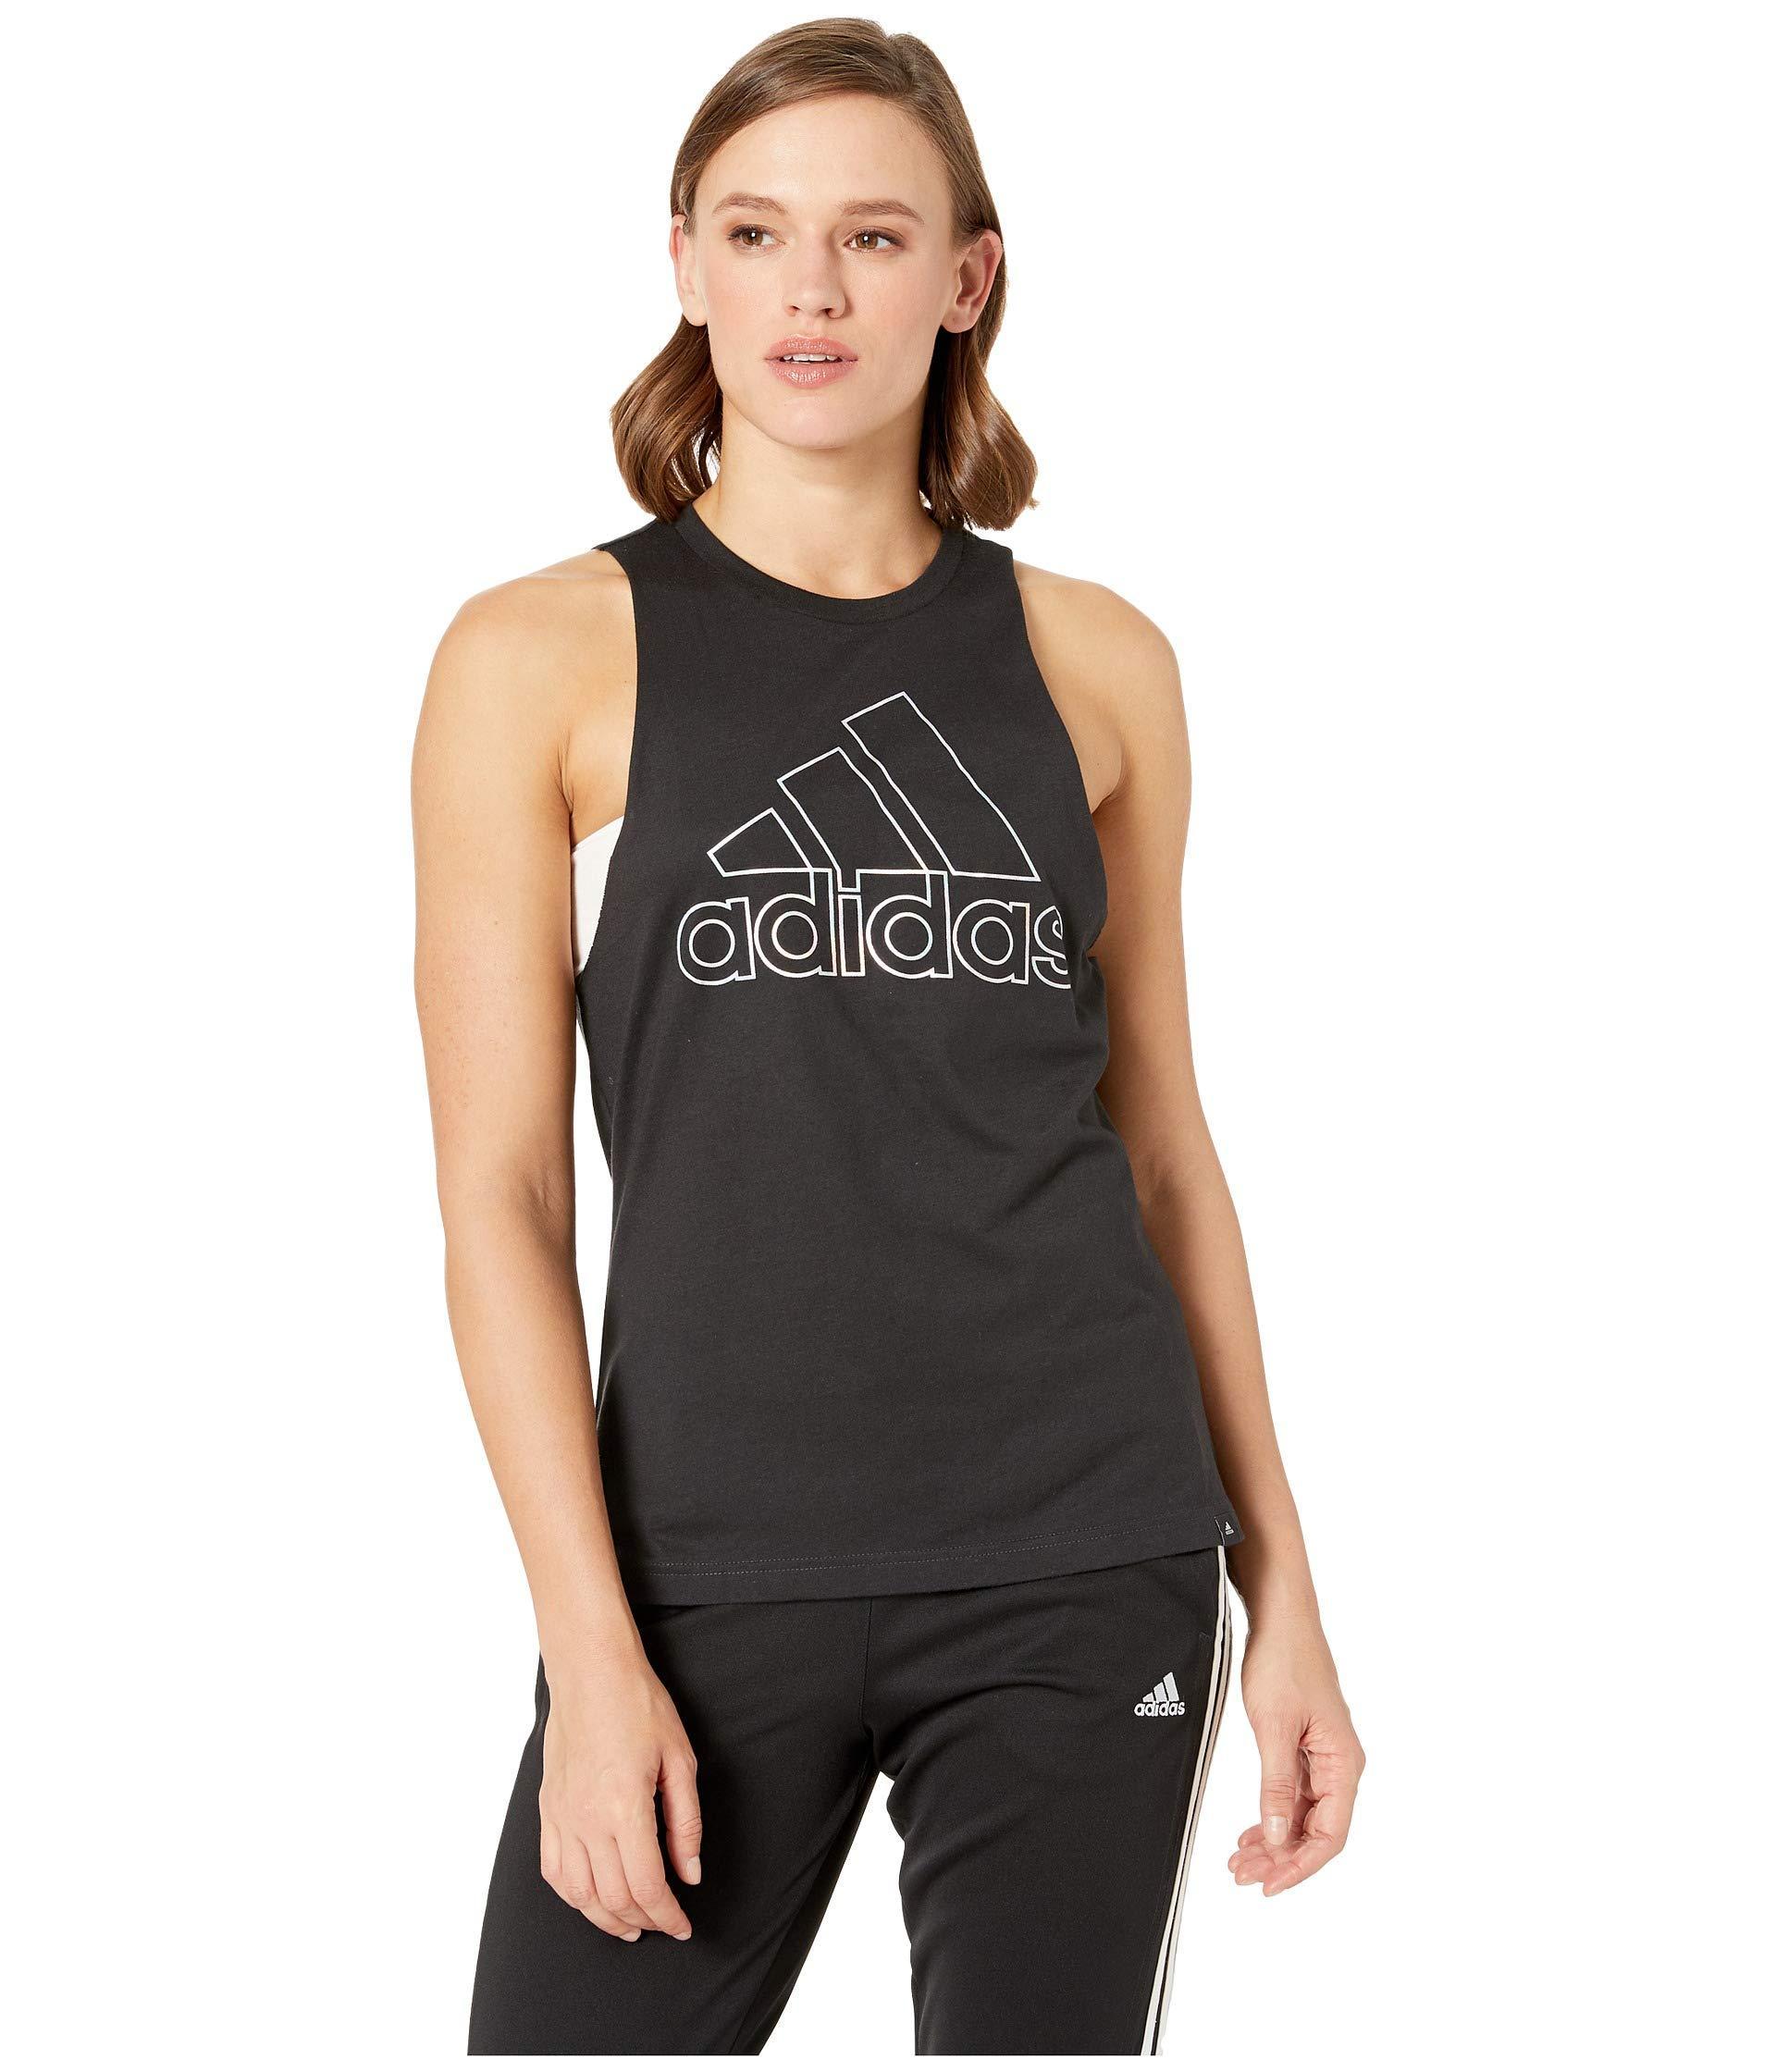 7effce404ec Adidas - Badge Of Sport Iridescent Muscle Tank Top (black) Women's  Sleeveless - Lyst. View fullscreen